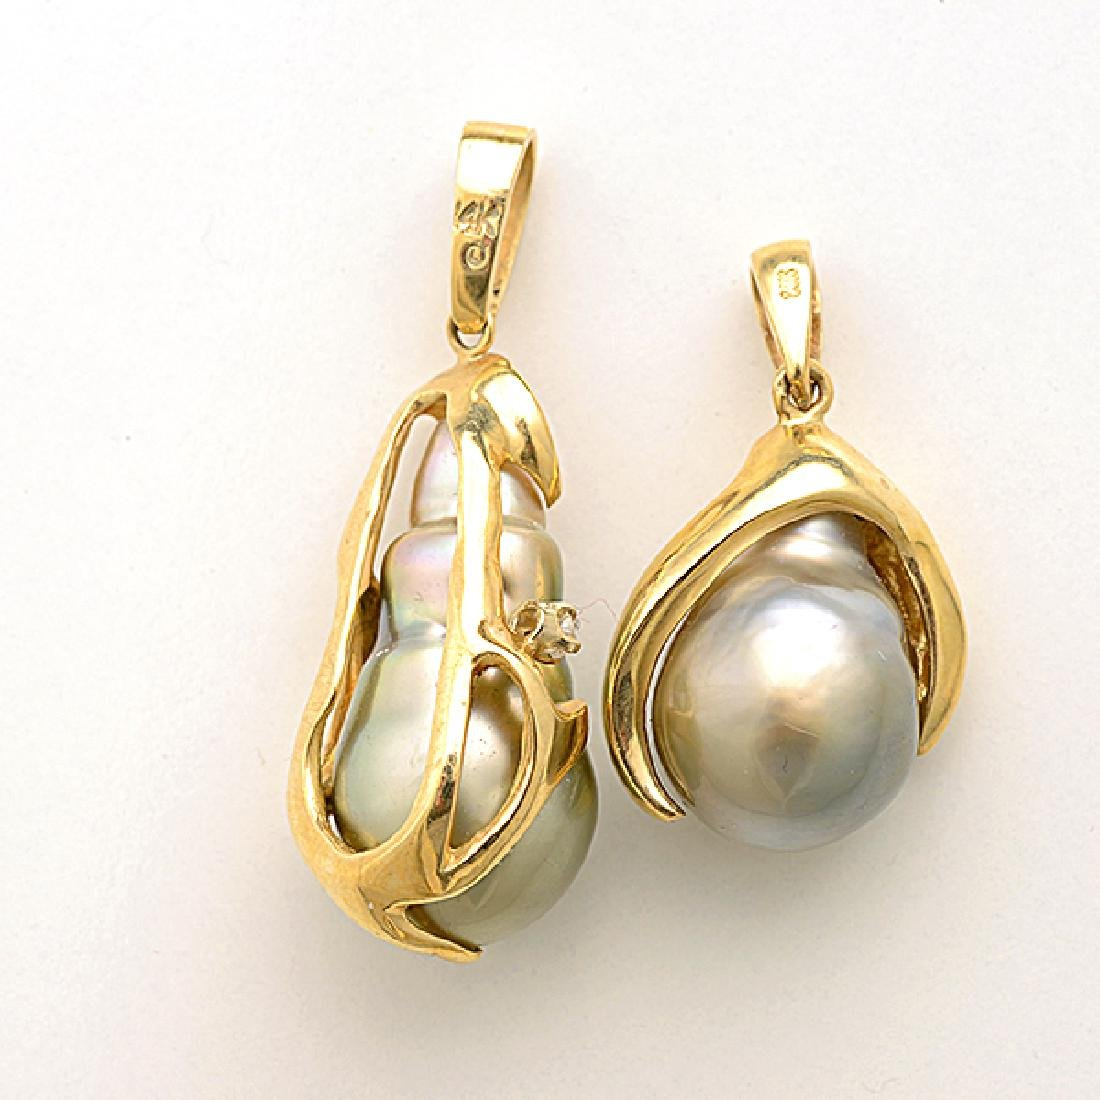 Baroque Cultured Pearl, Diamond, 14k Yellow Gold - 4